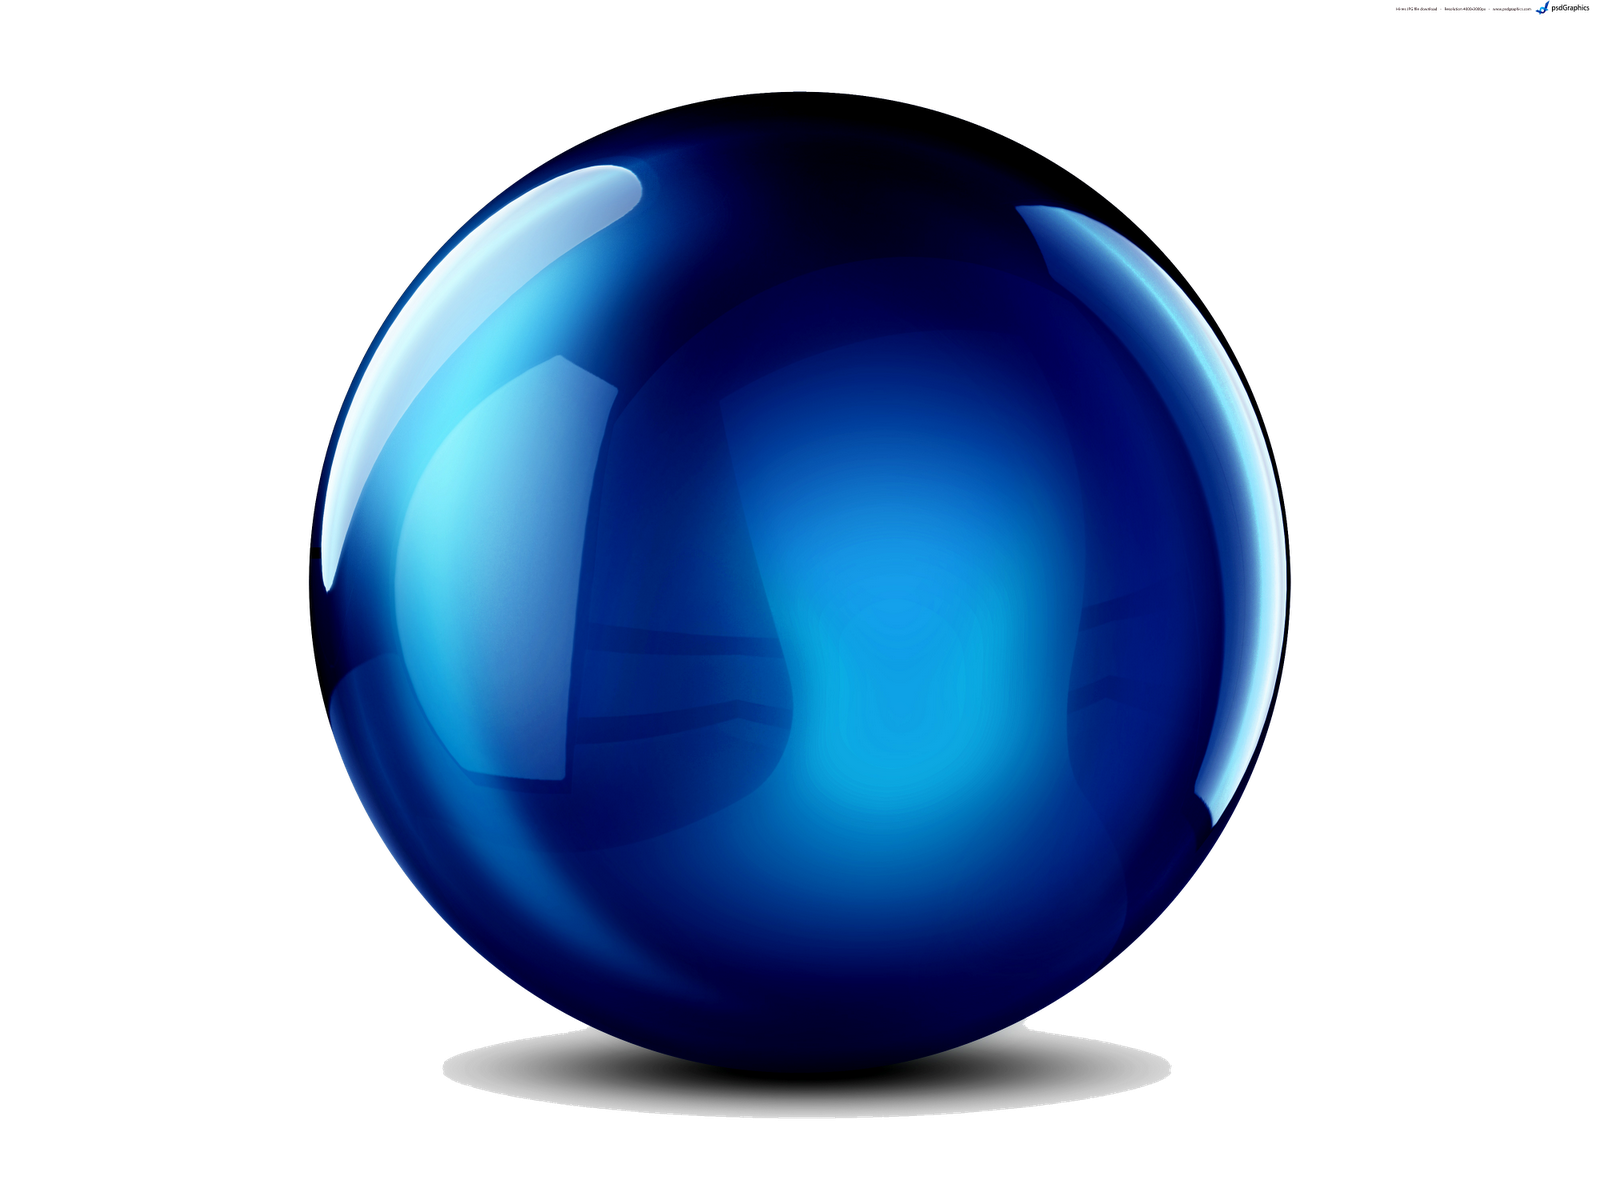 A bola de cristal online dating 6